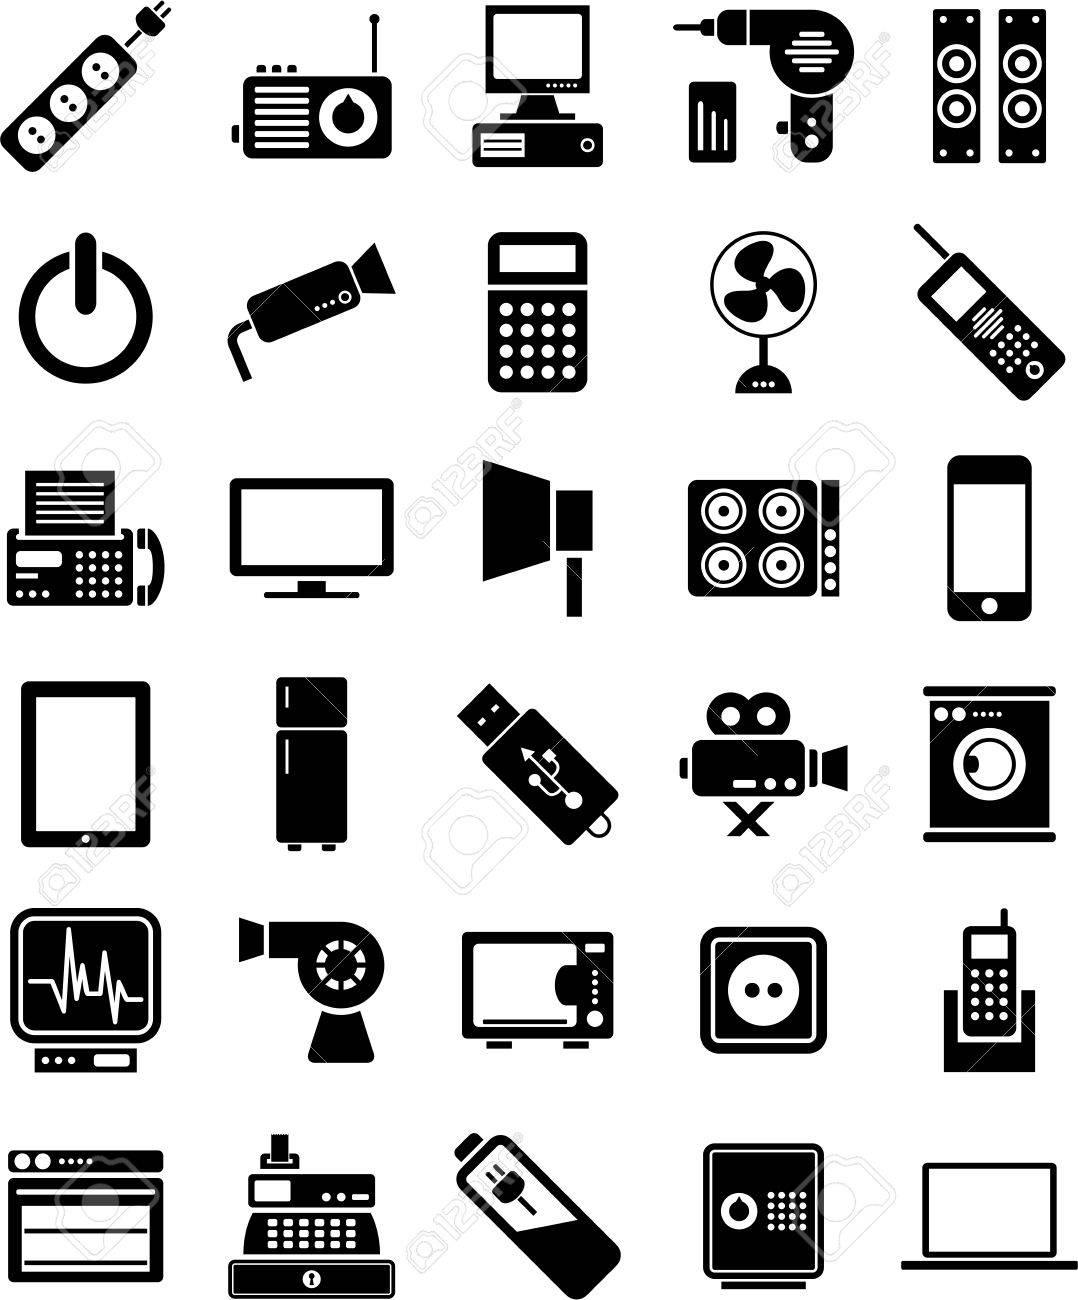 Elektronische Geräte Symbole Lizenzfrei Nutzbare Vektorgrafiken ...